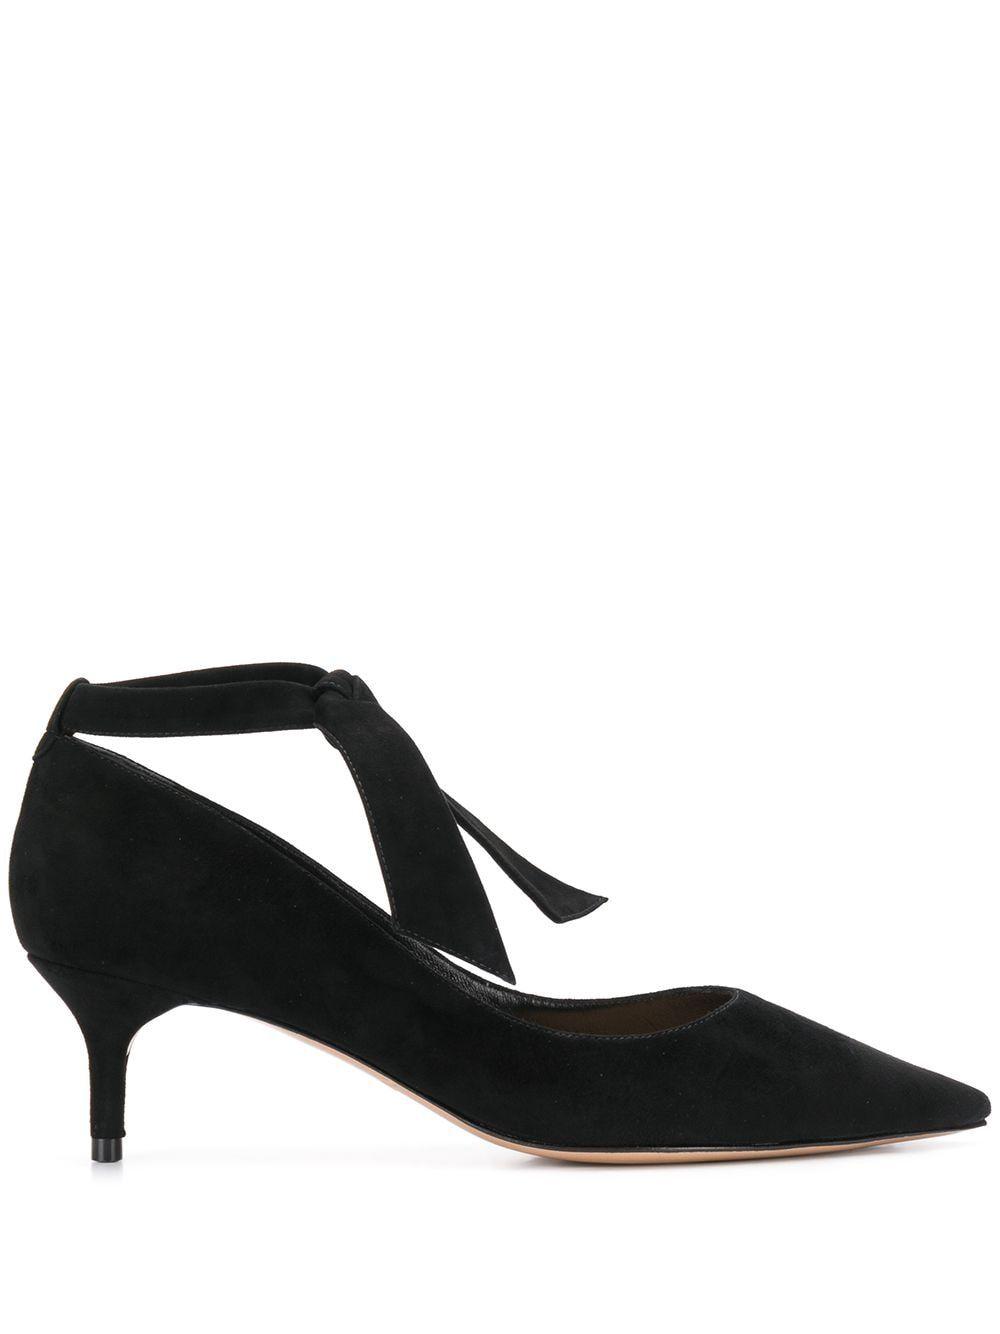 Alexandre Birman Clarita 600mm Heel Pumps Black In 2020 Pumps Heels Black Pumps Heels Heels